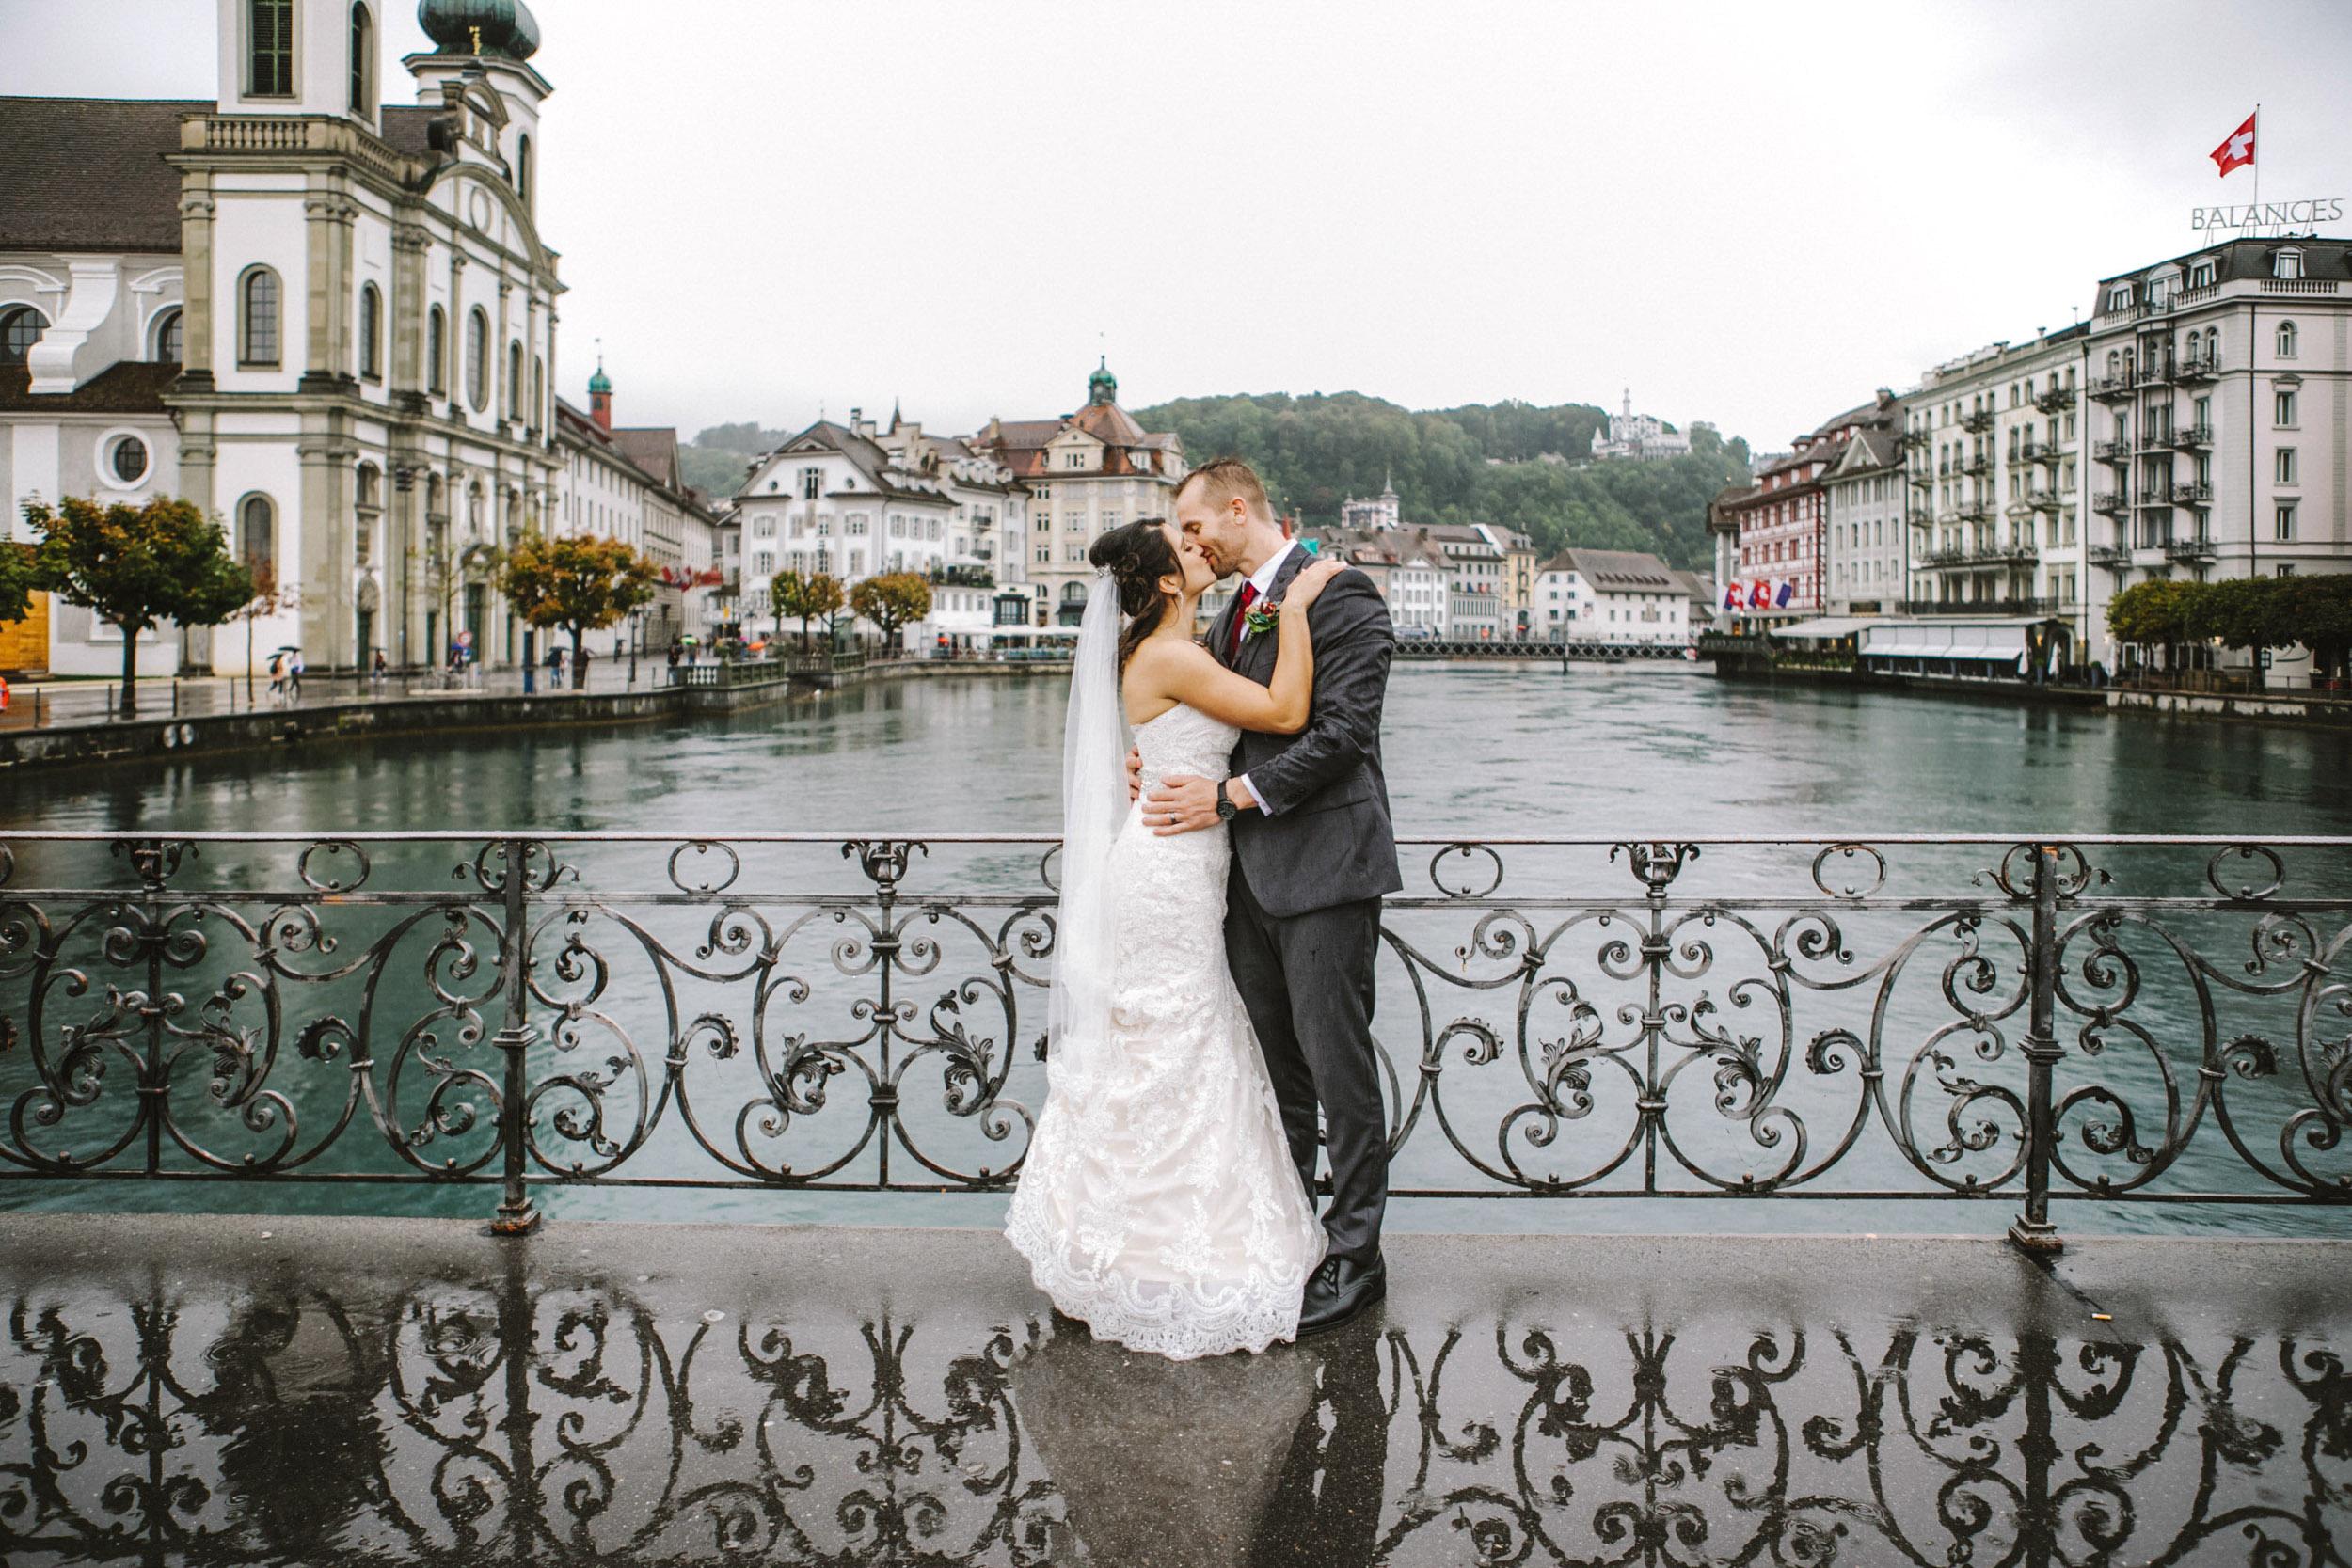 hochzeitsfotografie-schweiz_wedding-photographer-switzerland-europe_Bendik-Photography-118